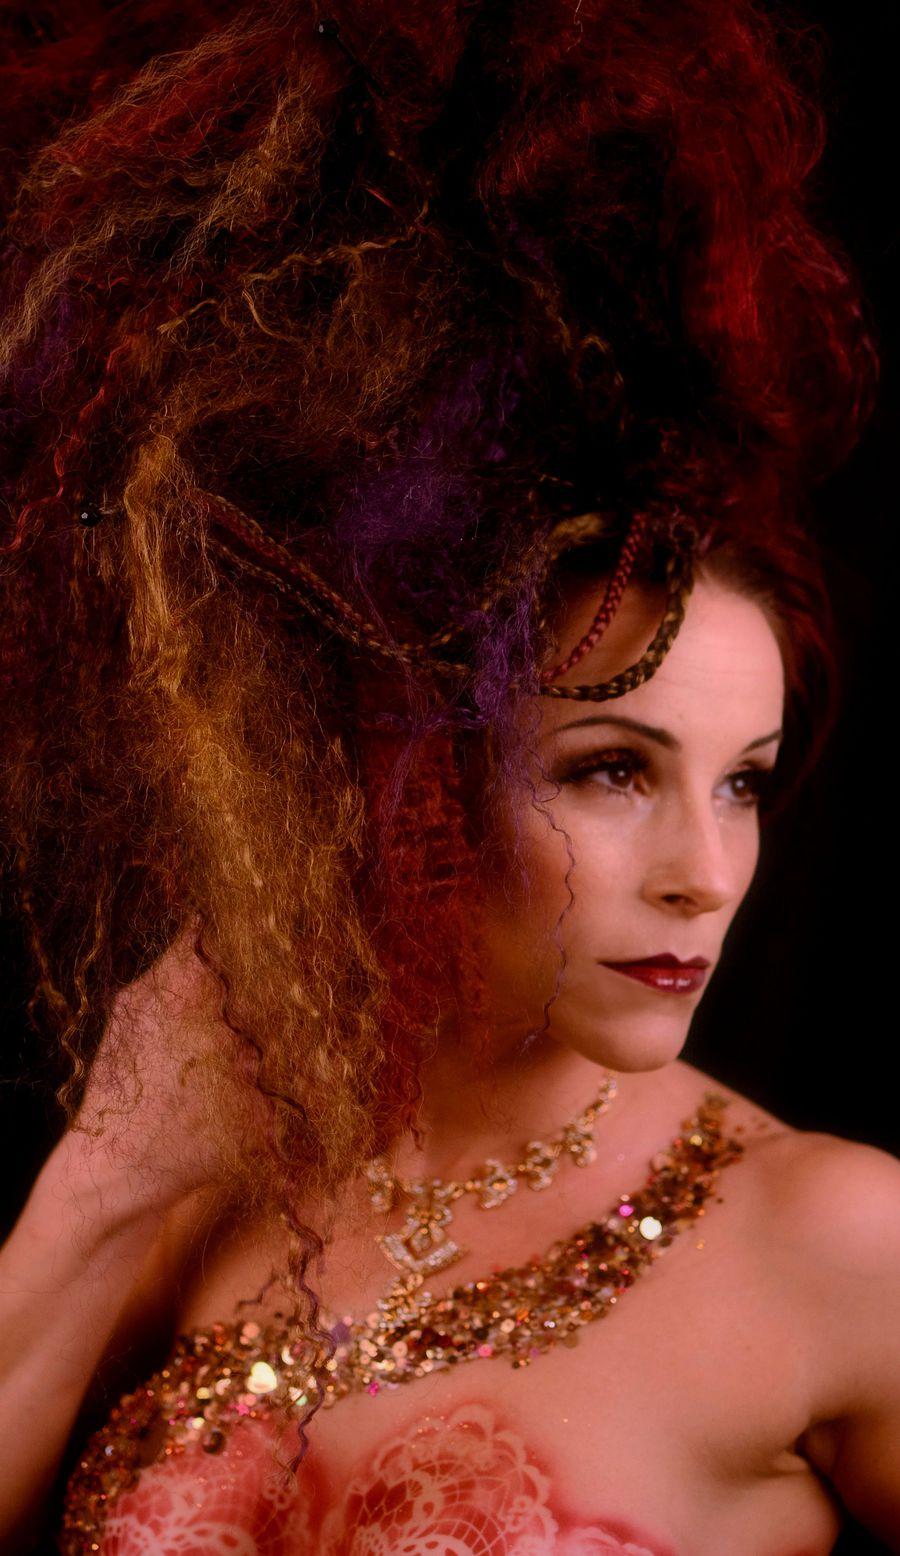 Avangarde Hairscuplture & Bodypainting / Makeup by pierangela manzetti, Hair styling by pierangela manzetti, Artwork by pierangela manzetti, Designer pierangela manzetti / Uploaded 24th October 2016 @ 06:00 PM